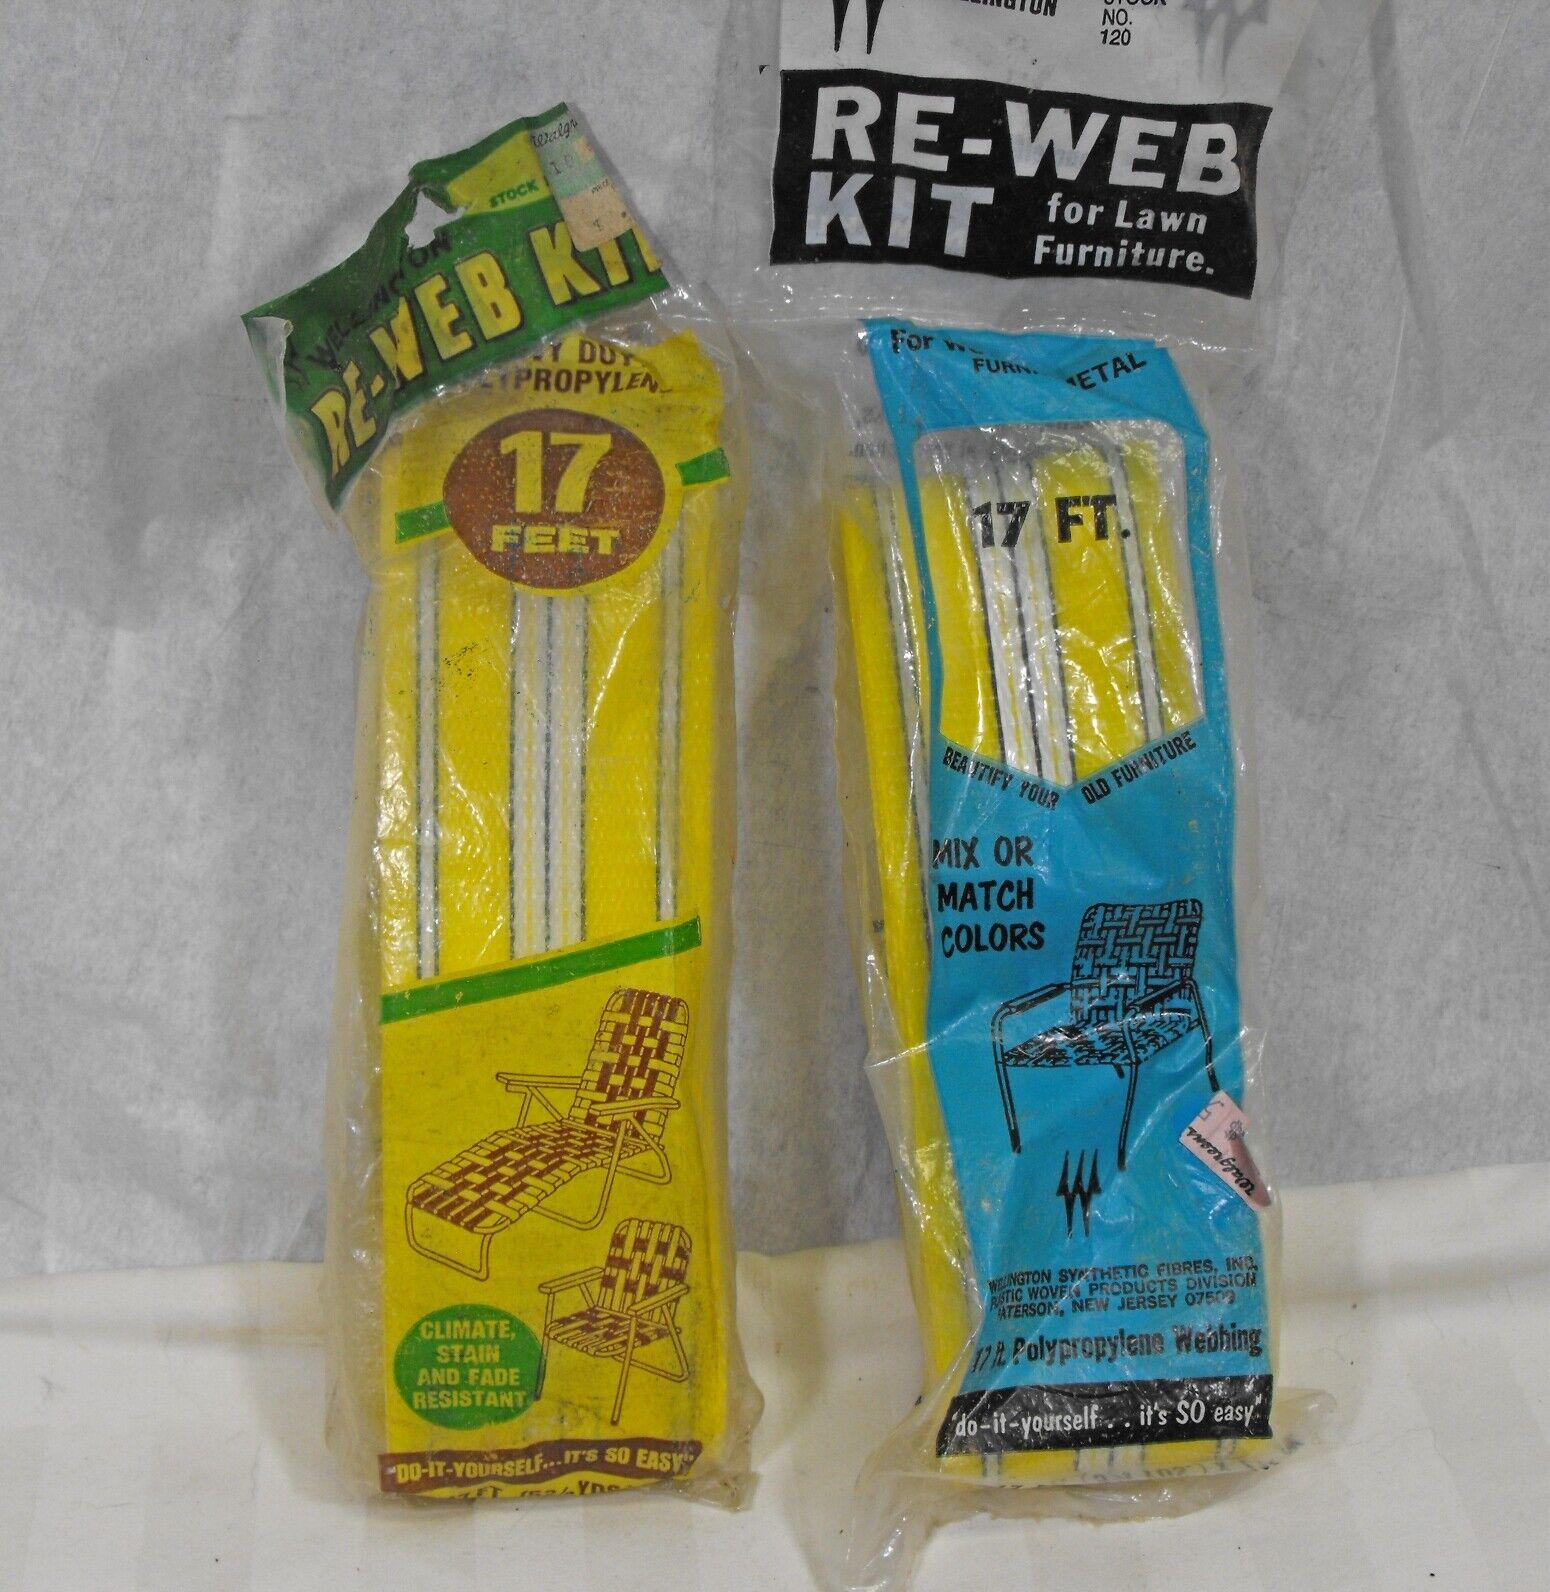 Vintage Aluminum Lawn Chair Webbing Re Web Kit Lemon Yellow Striped Nos 34 Feet For Sale Online